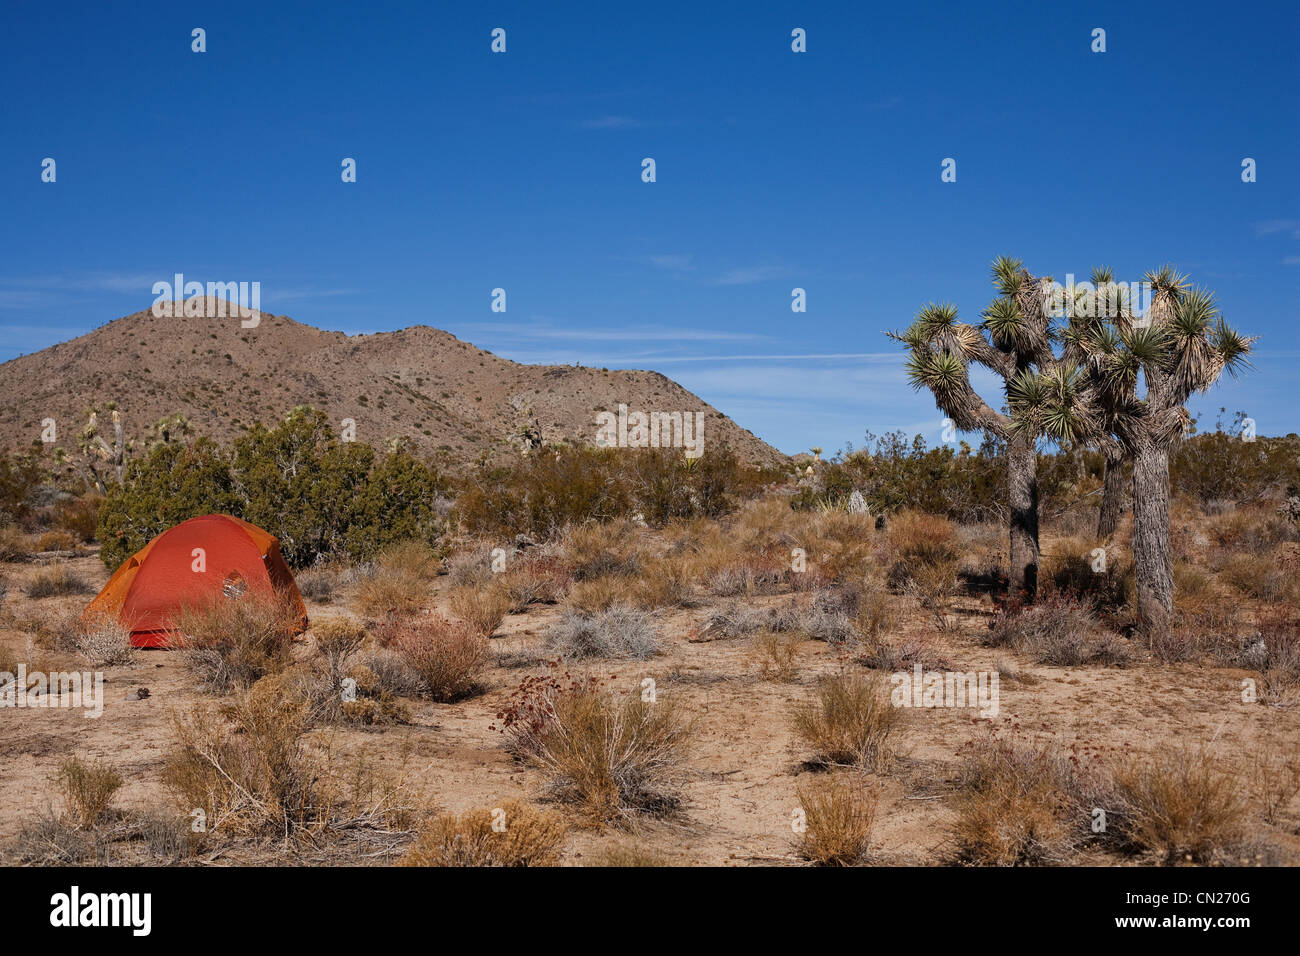 Tent in Joshua Tree national park, California, USA Stock Photo